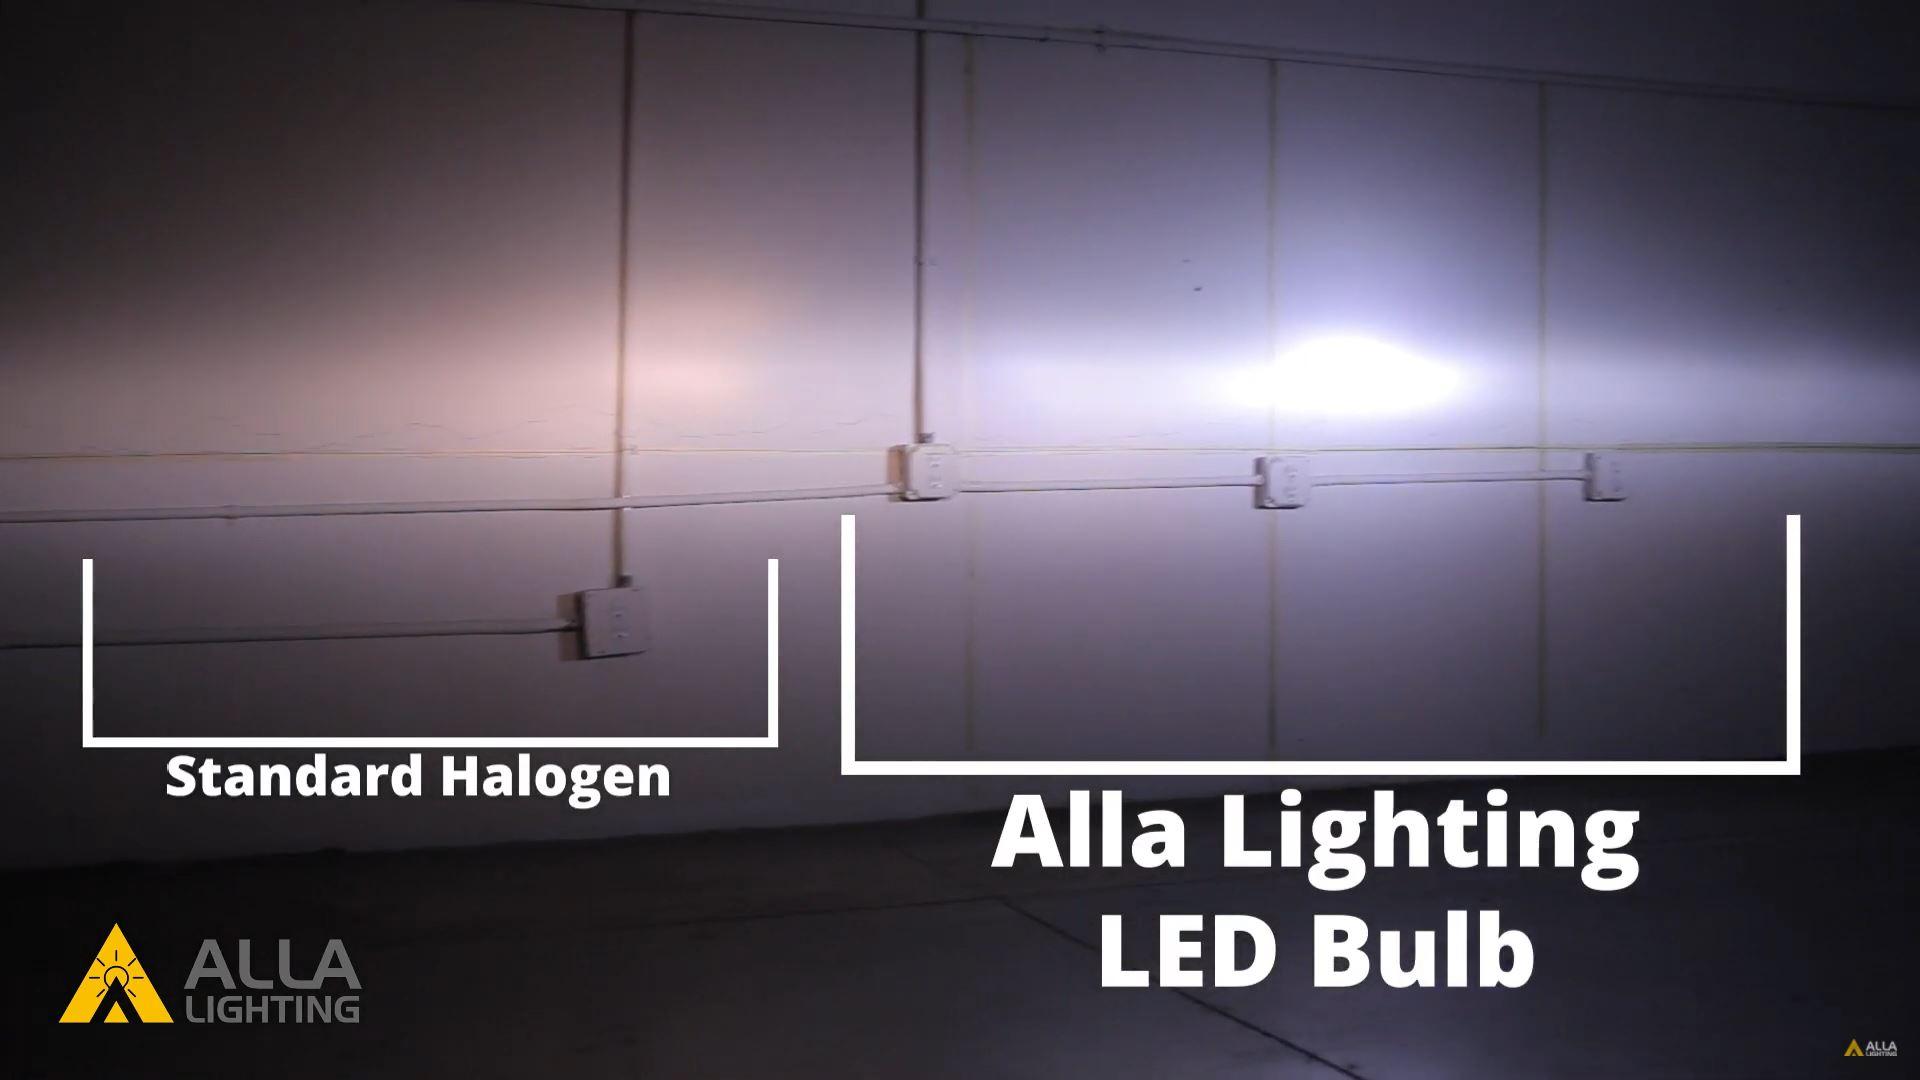 Sylvania-halogen-headlamps-vs-led-headlights-alla-lighting-white-bulb